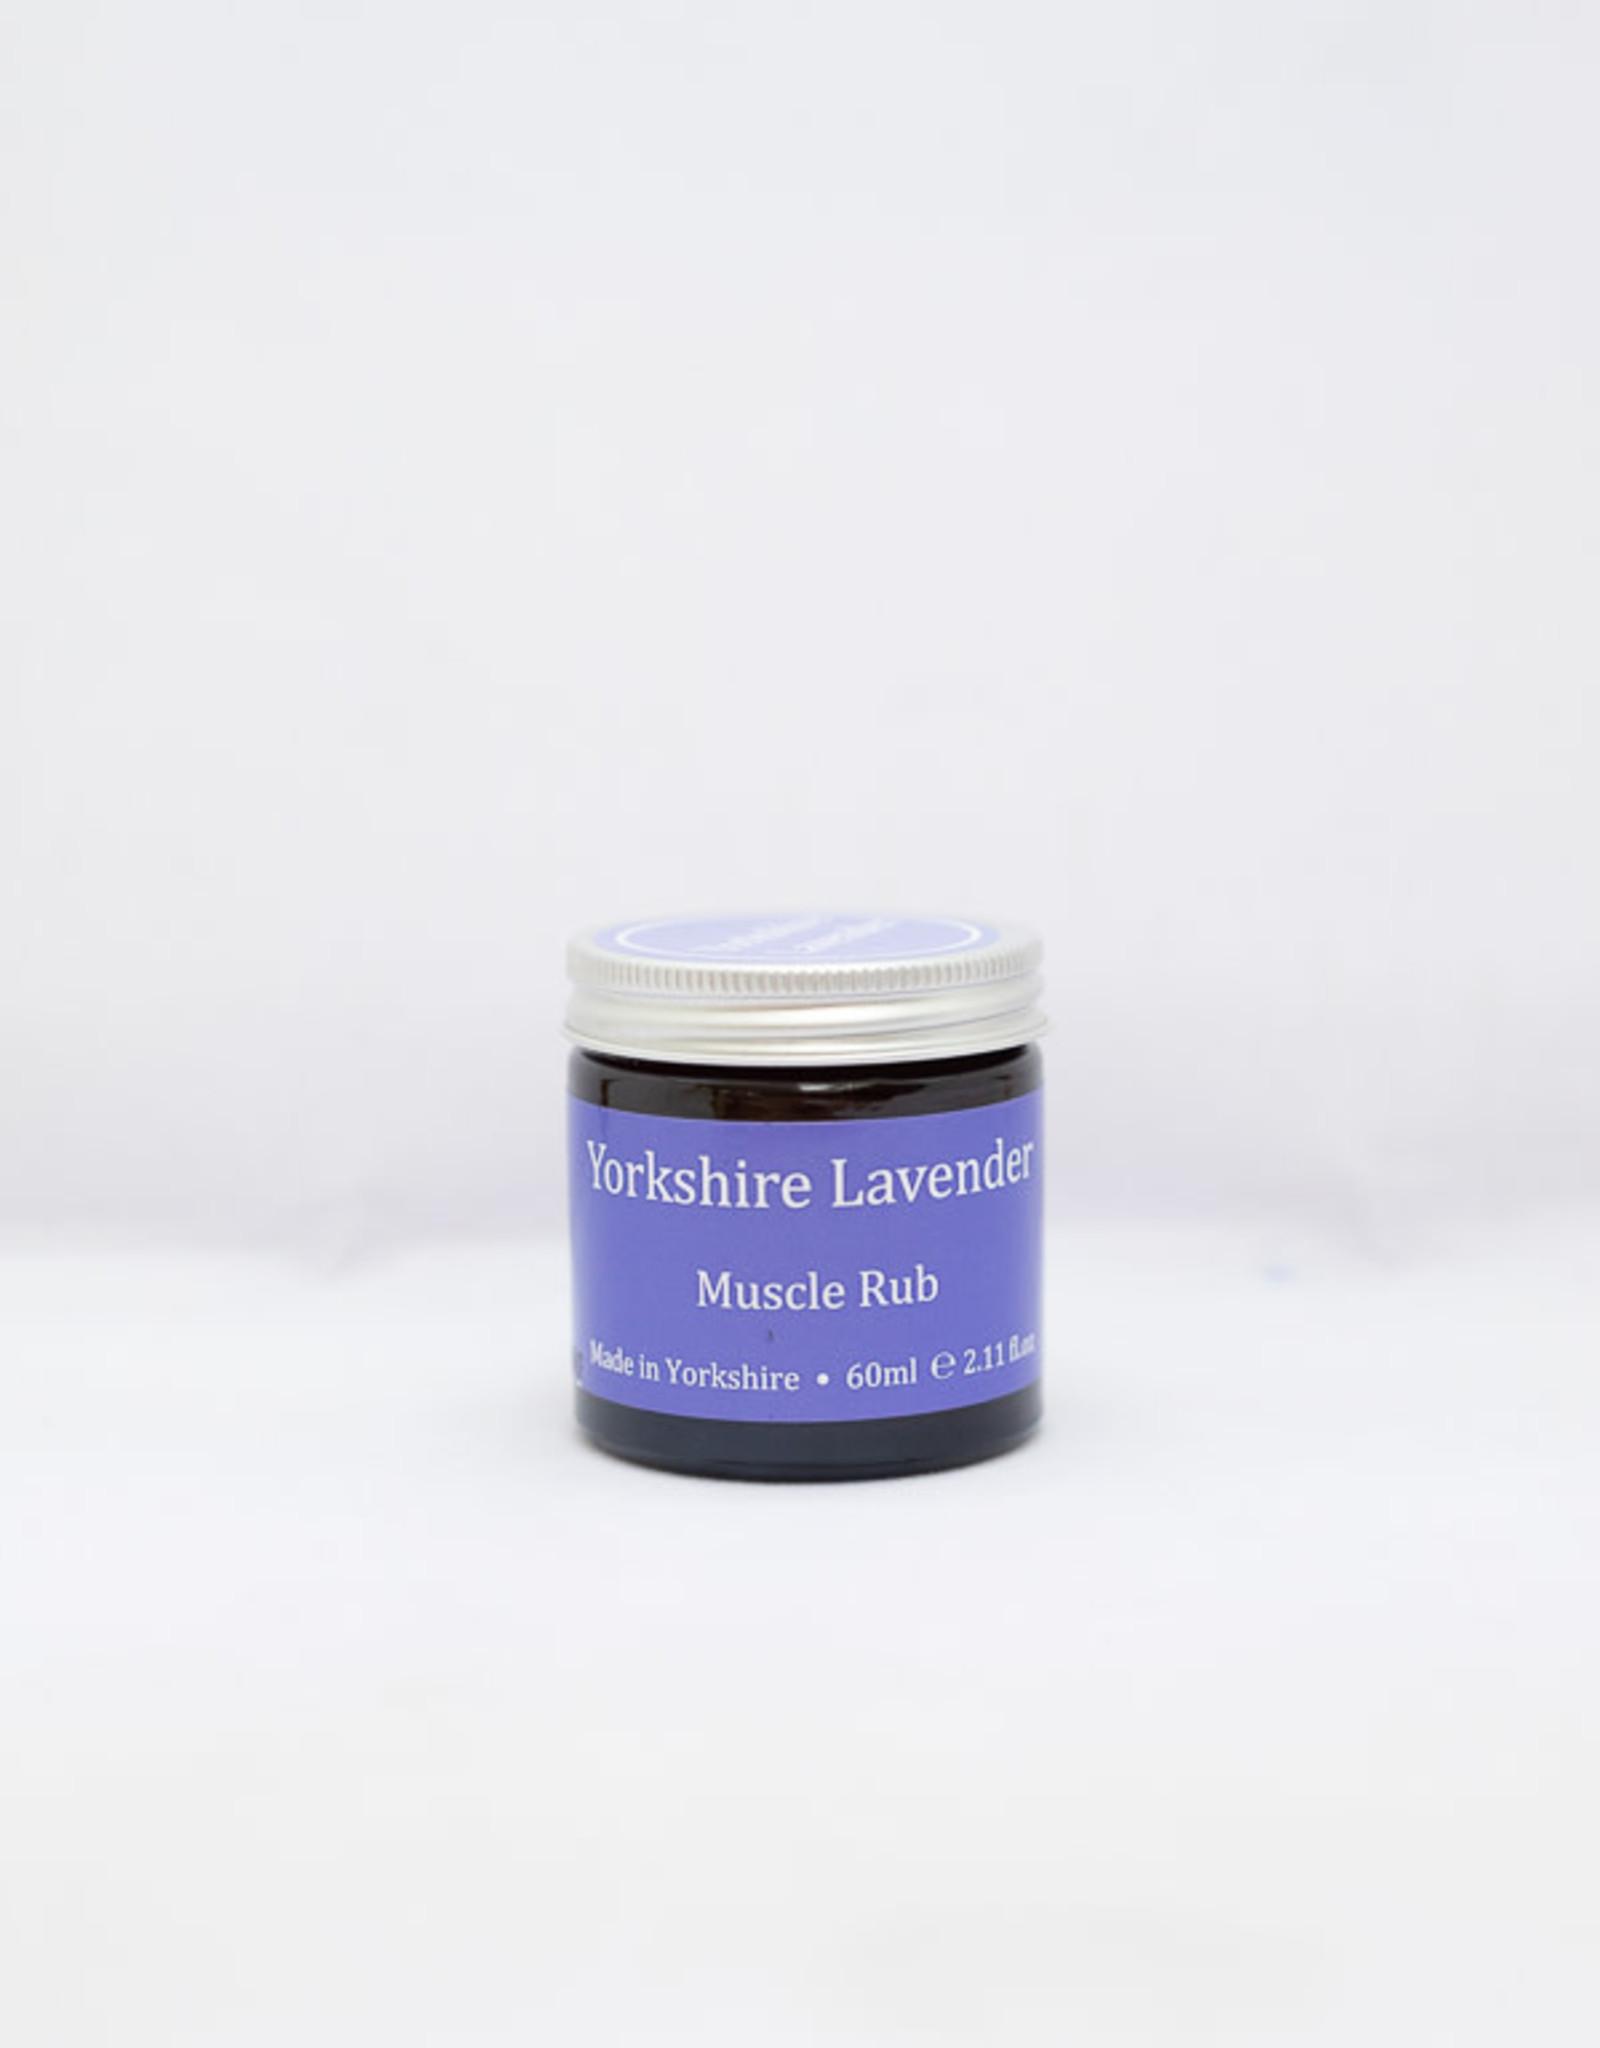 Yorkshire Lavender Muscle Rub